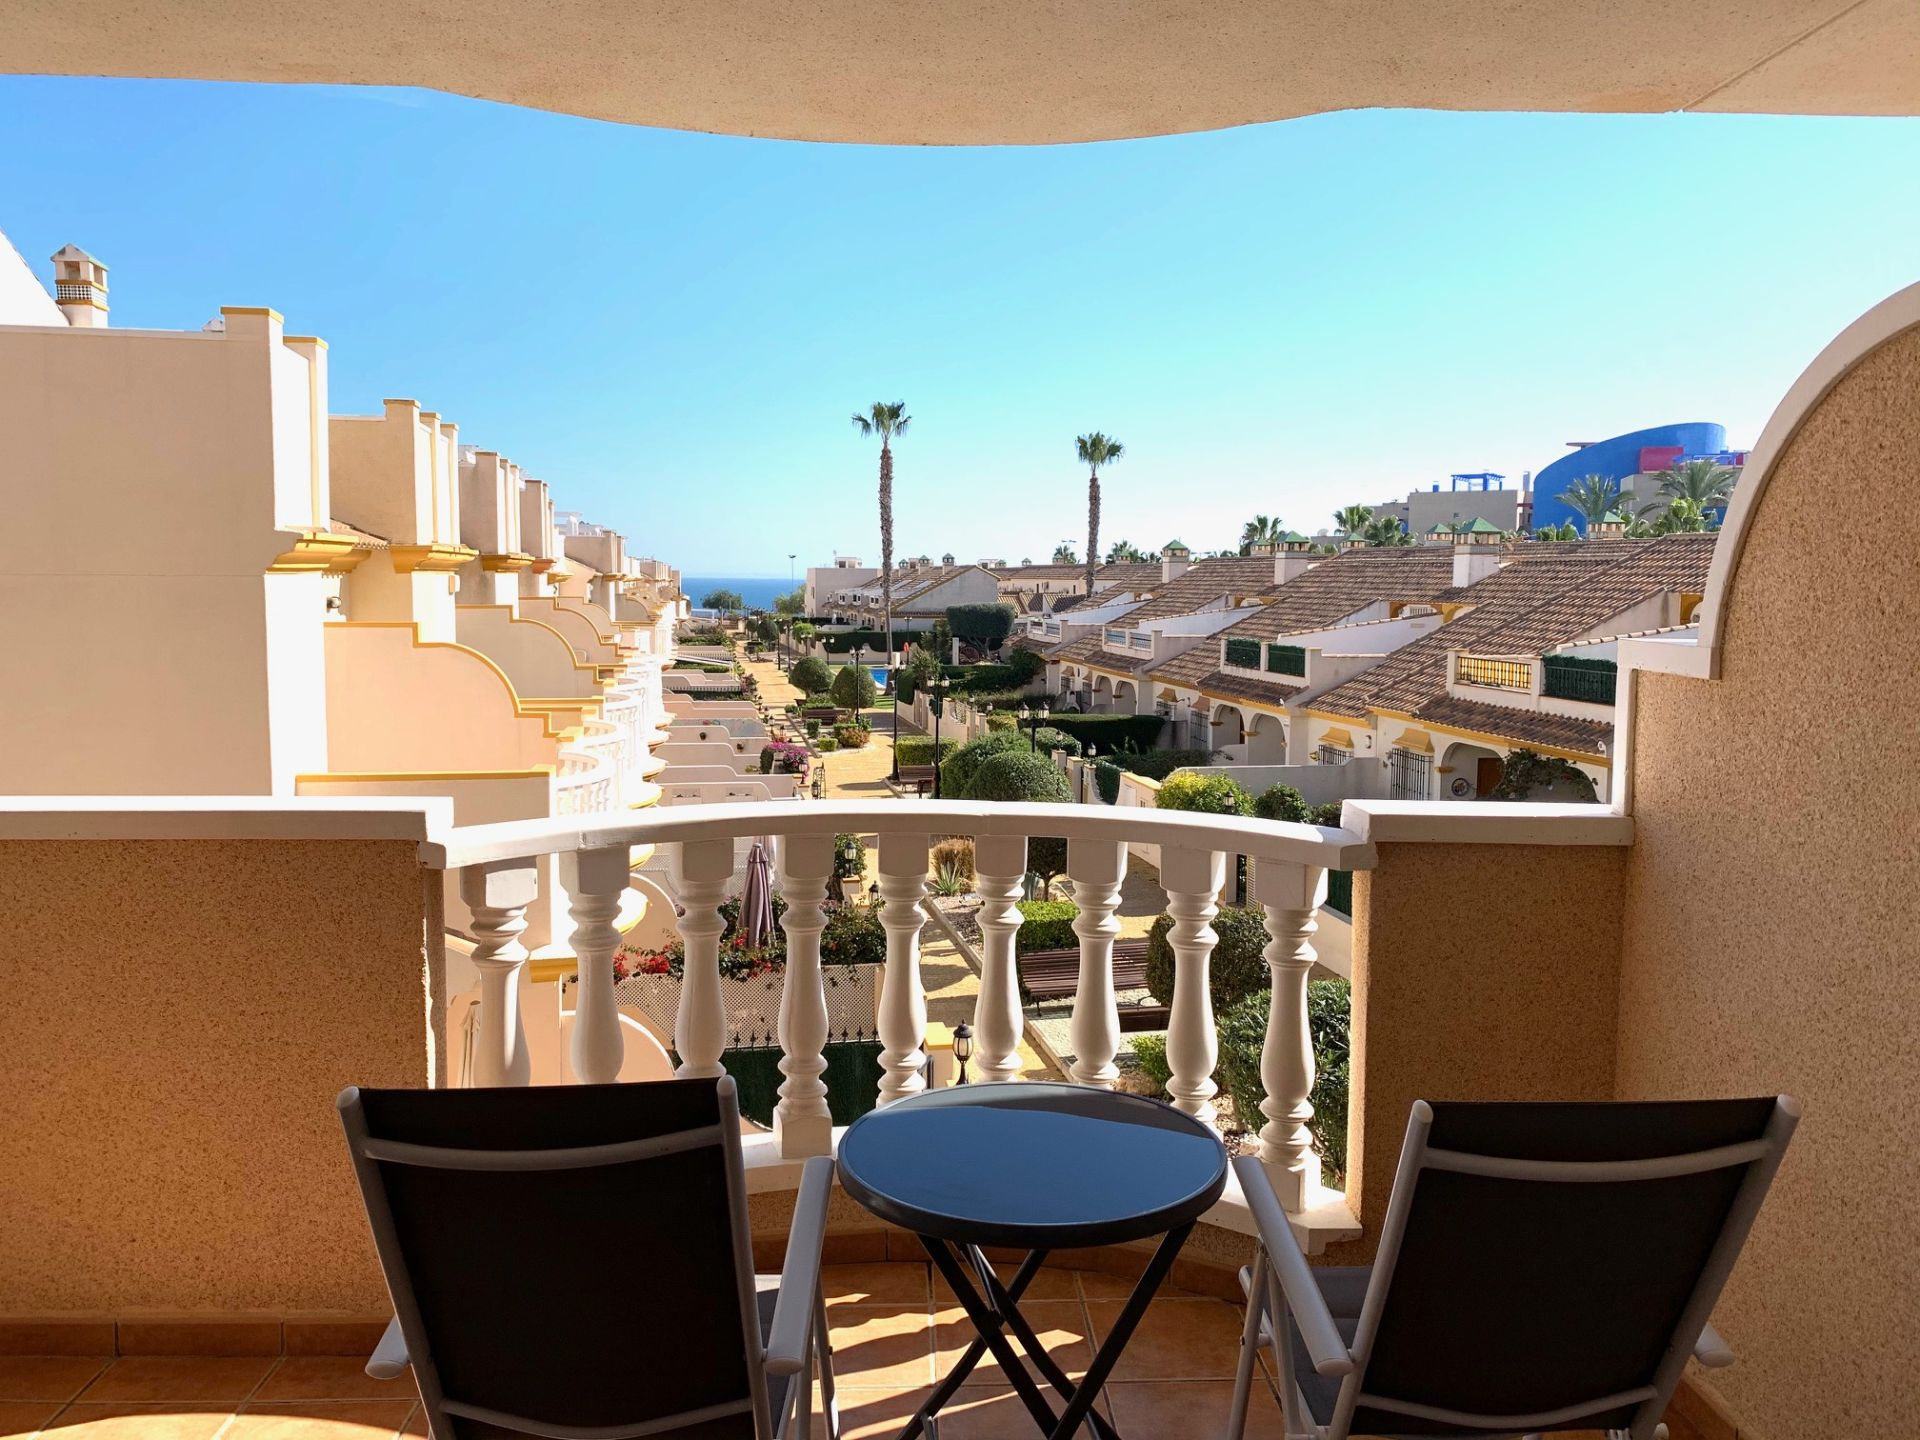 Apartment in Orihuela Costa, Cabo Roig, holiday rentals